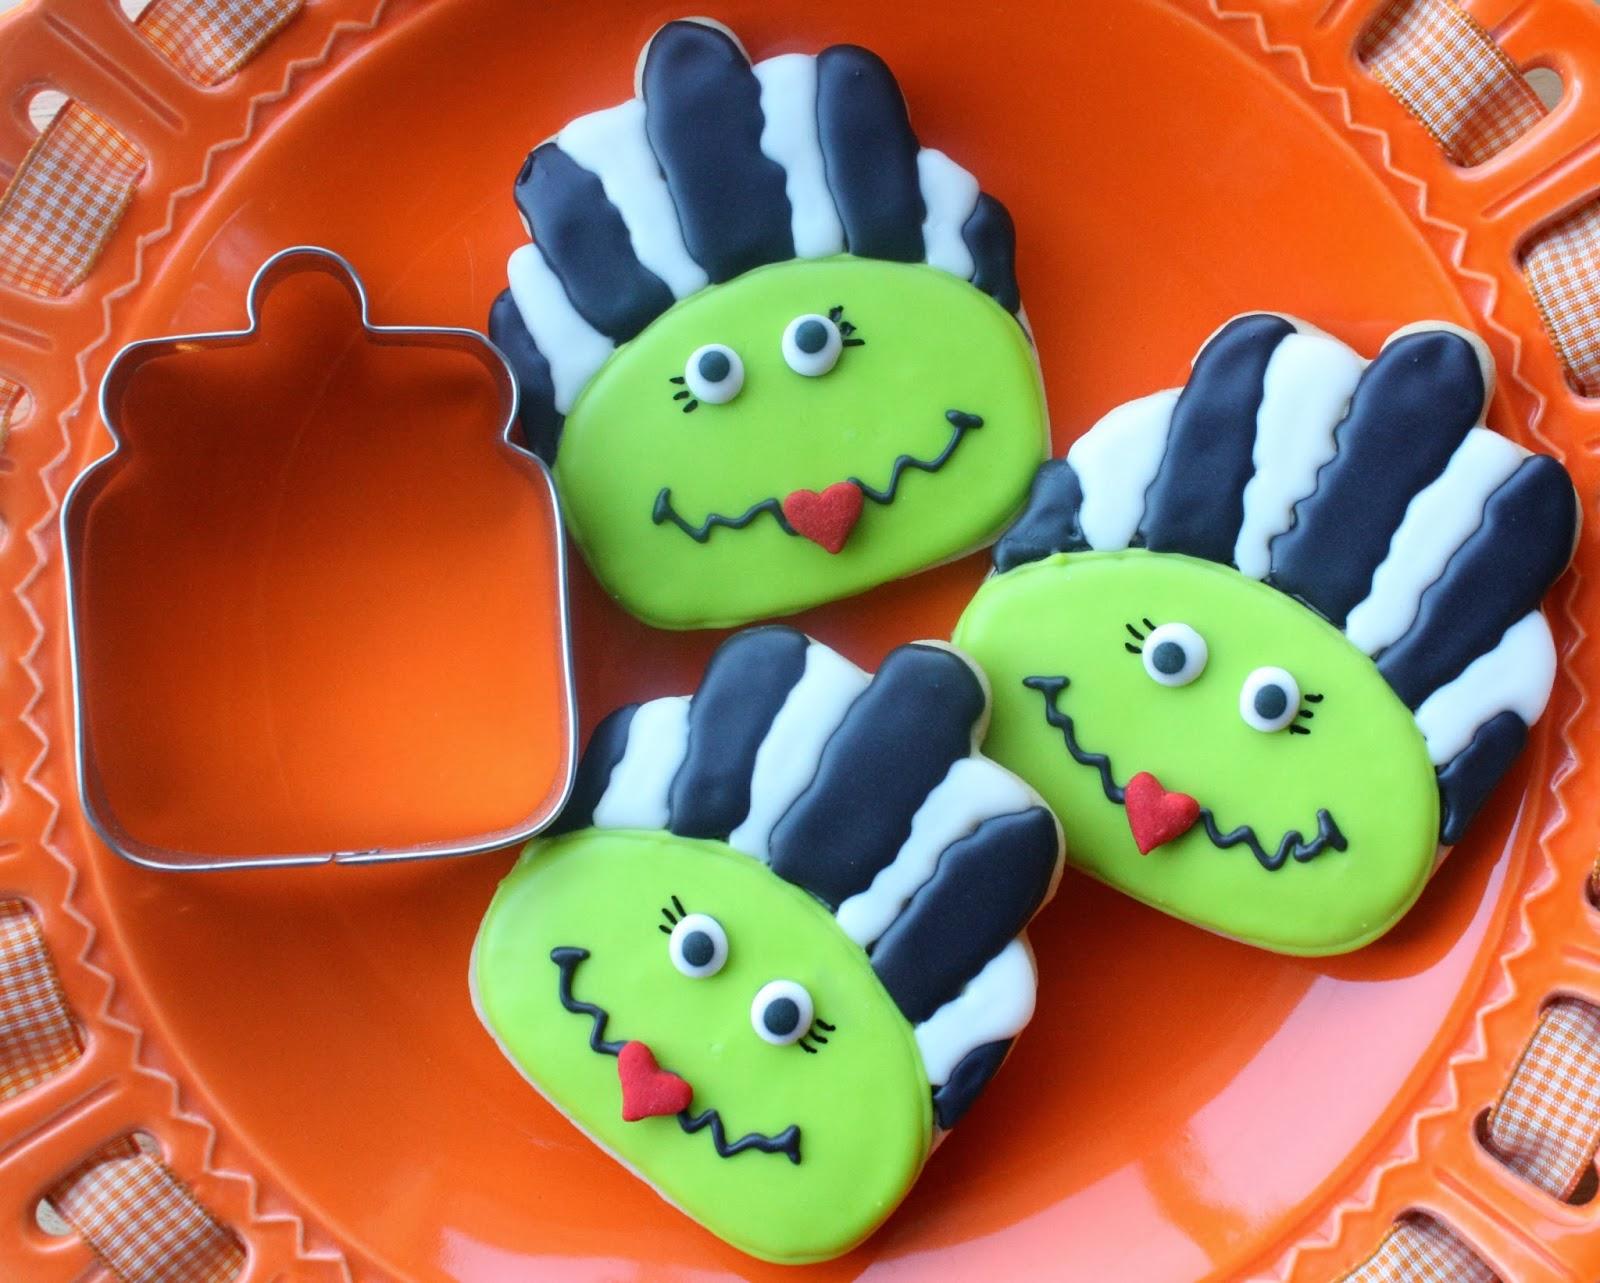 Munchkin Munchies Bride Of Frankenstein Cookies Via A Cookie Jar Cutter